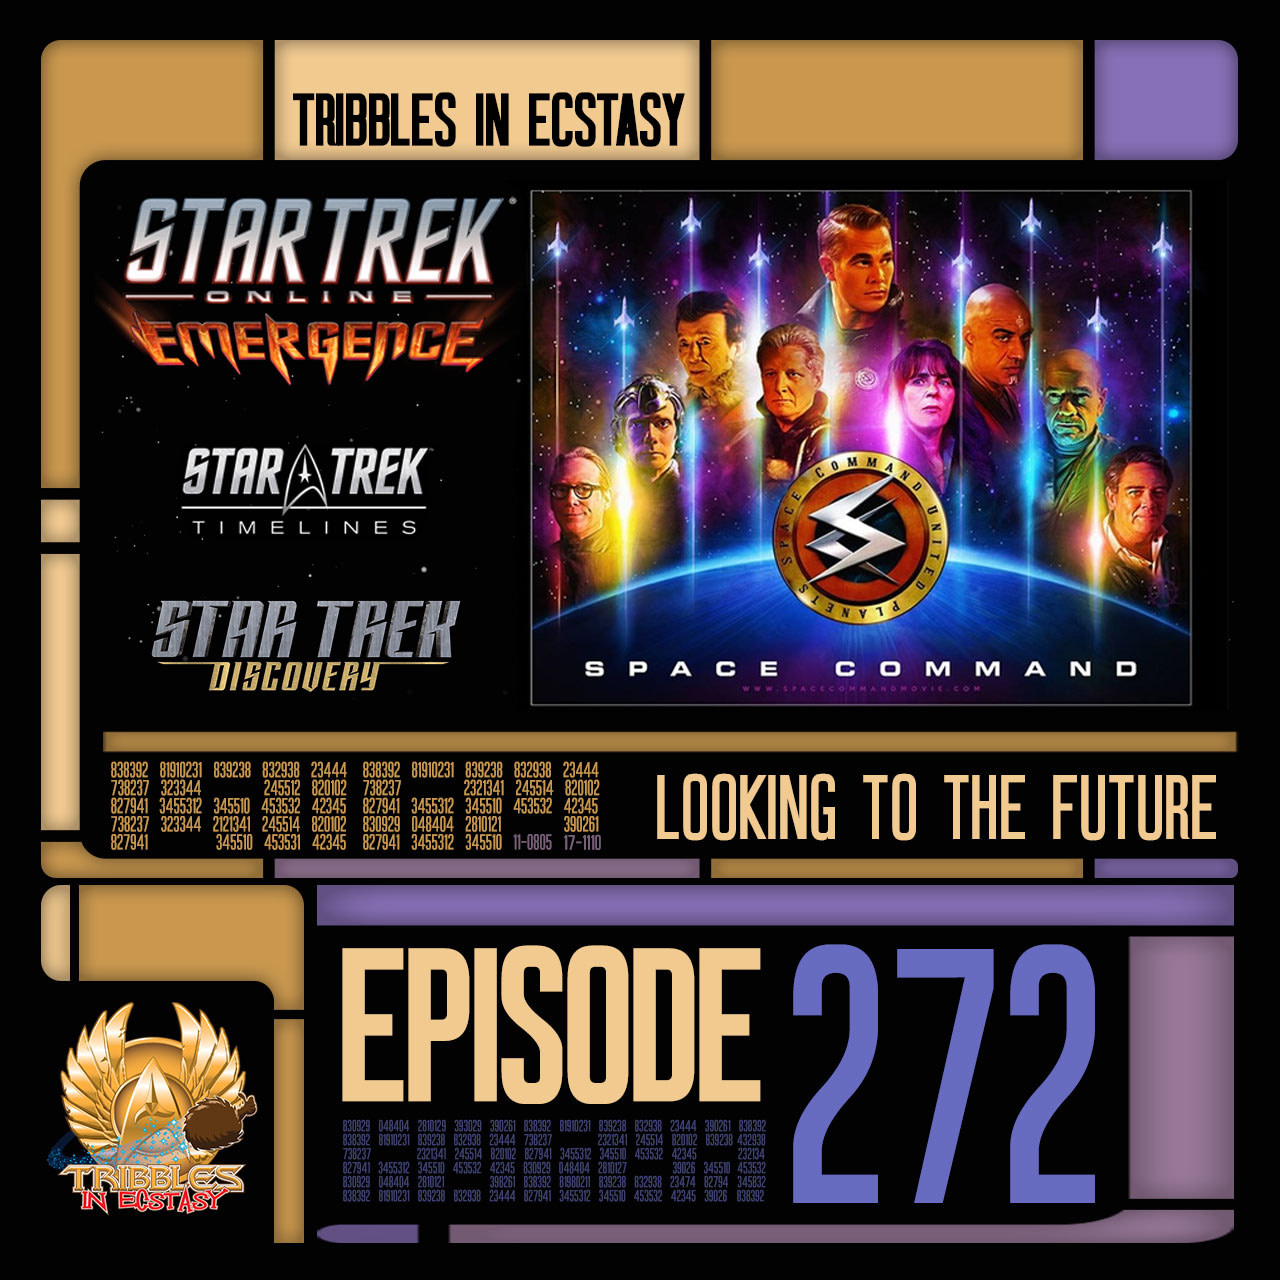 Tribbles in Ecstasy Episode 272